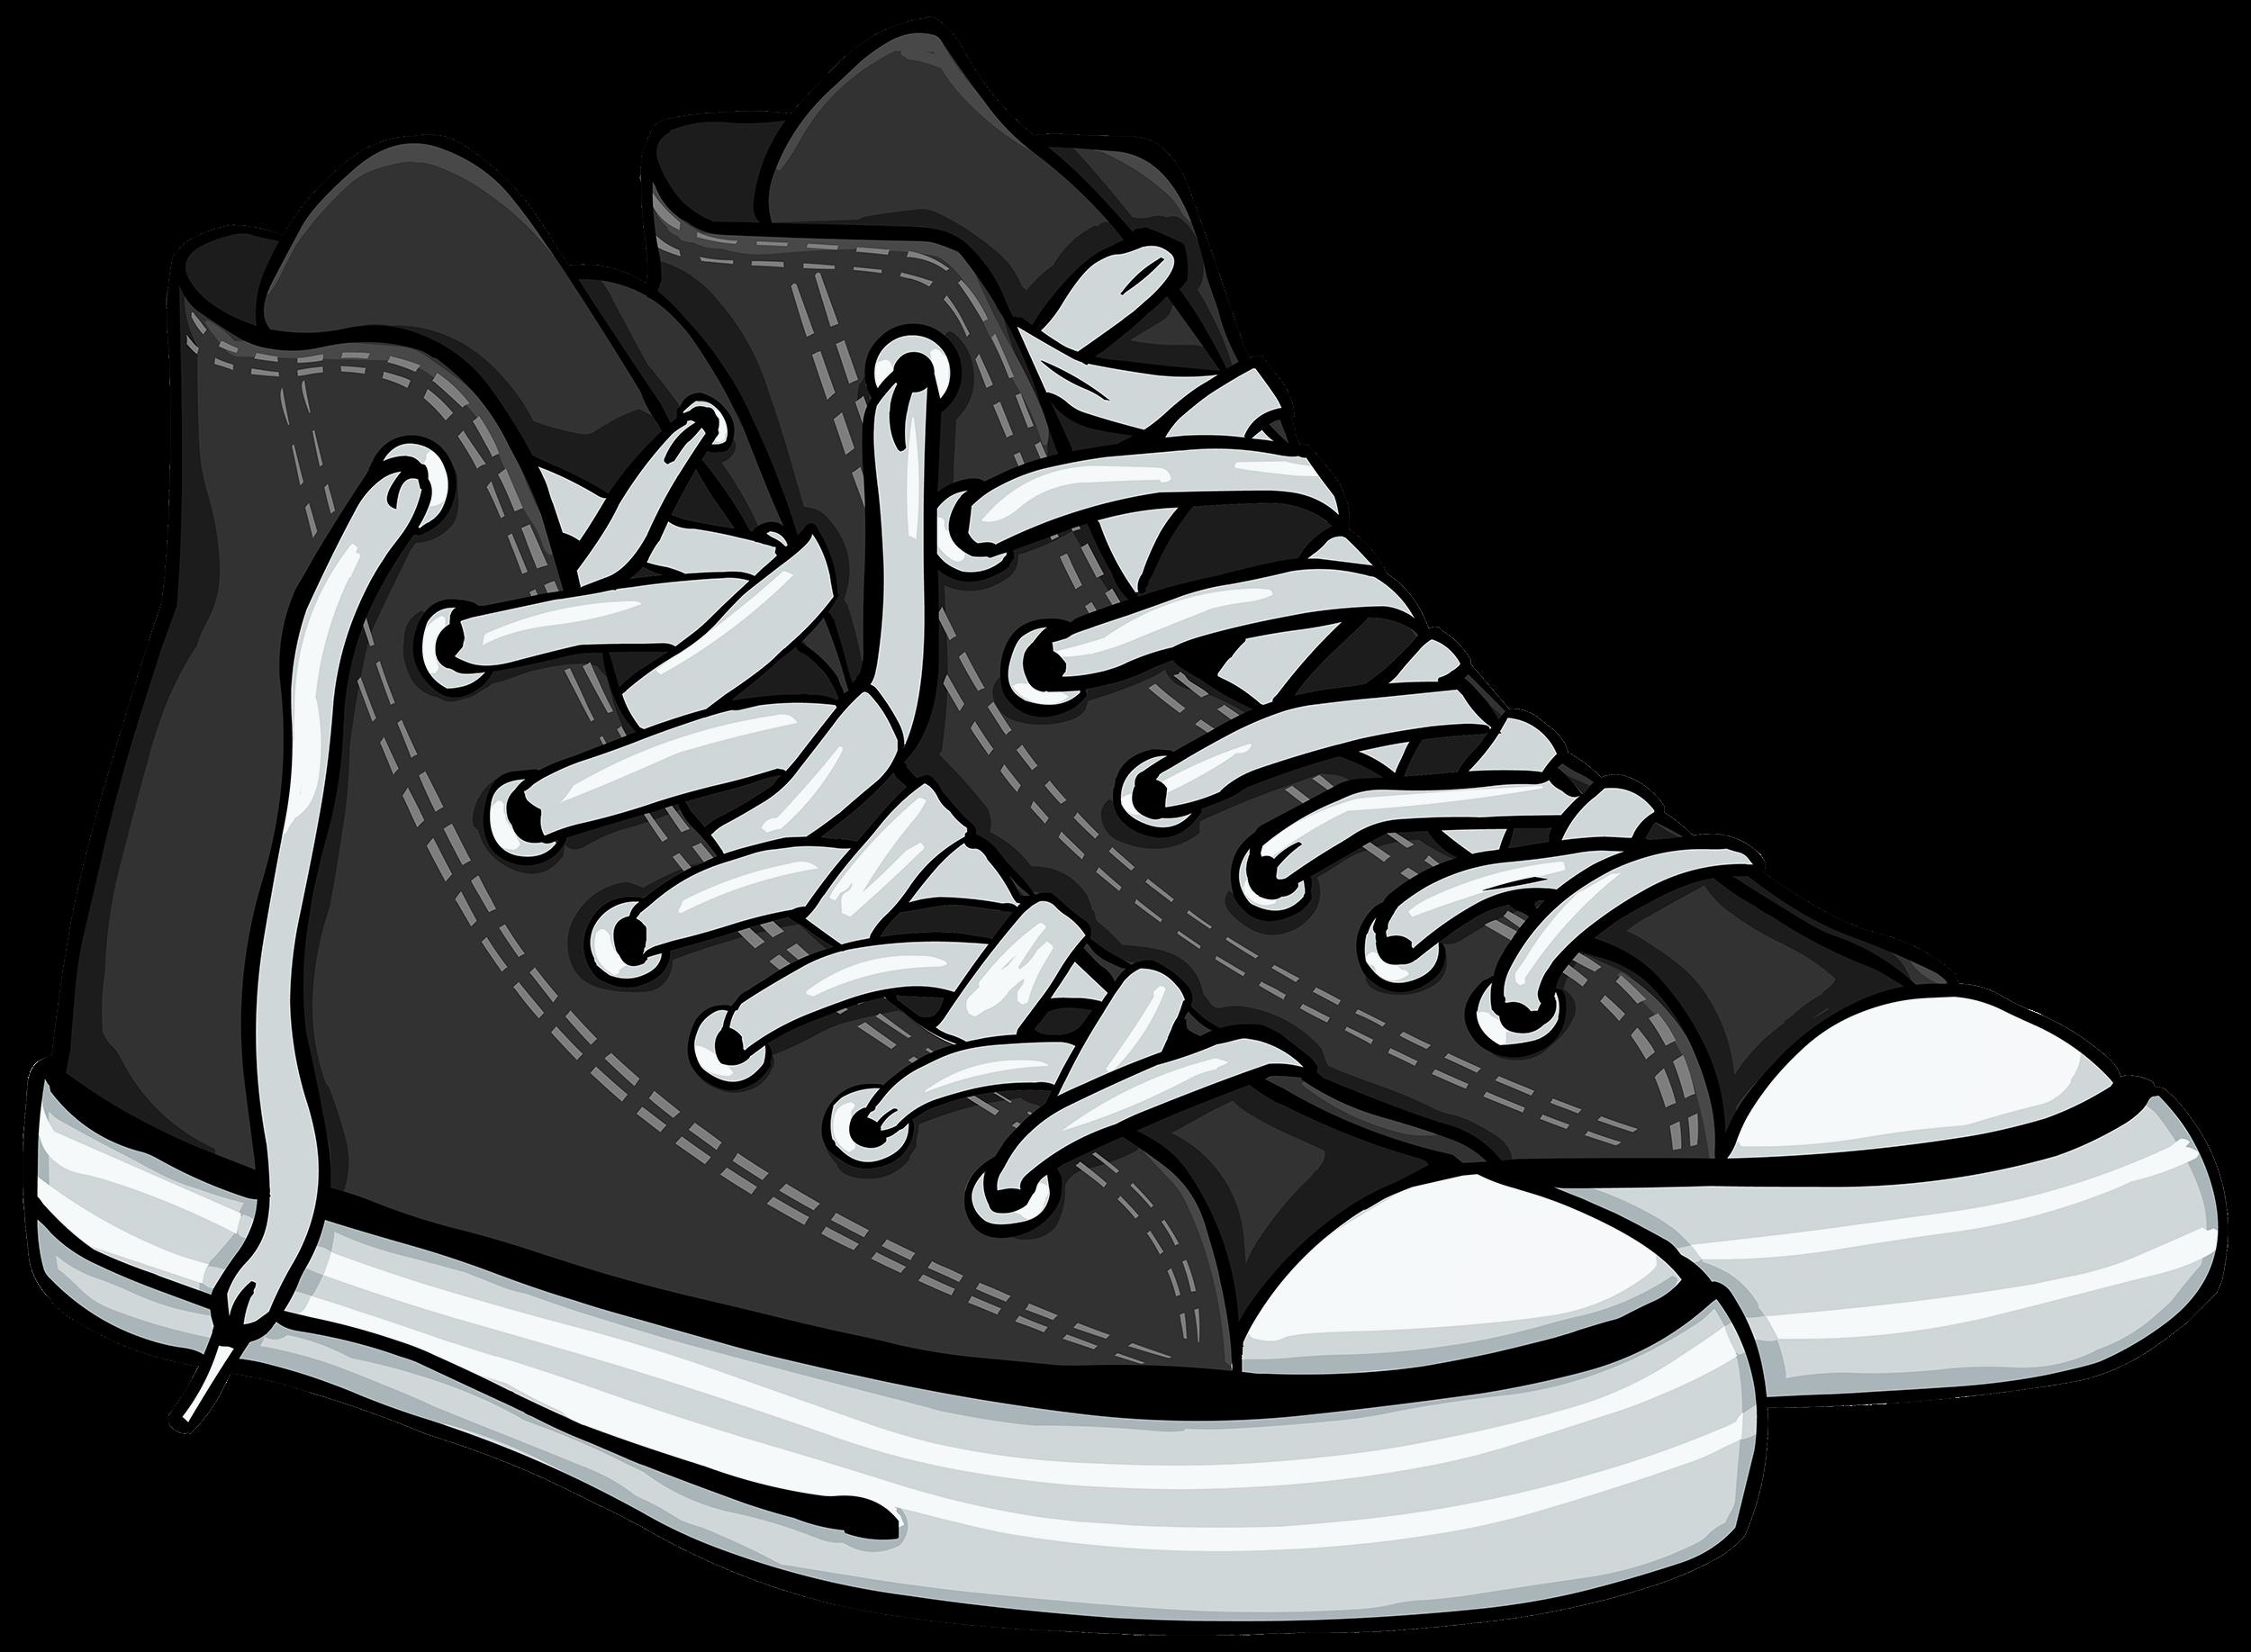 Converse shoes PNG